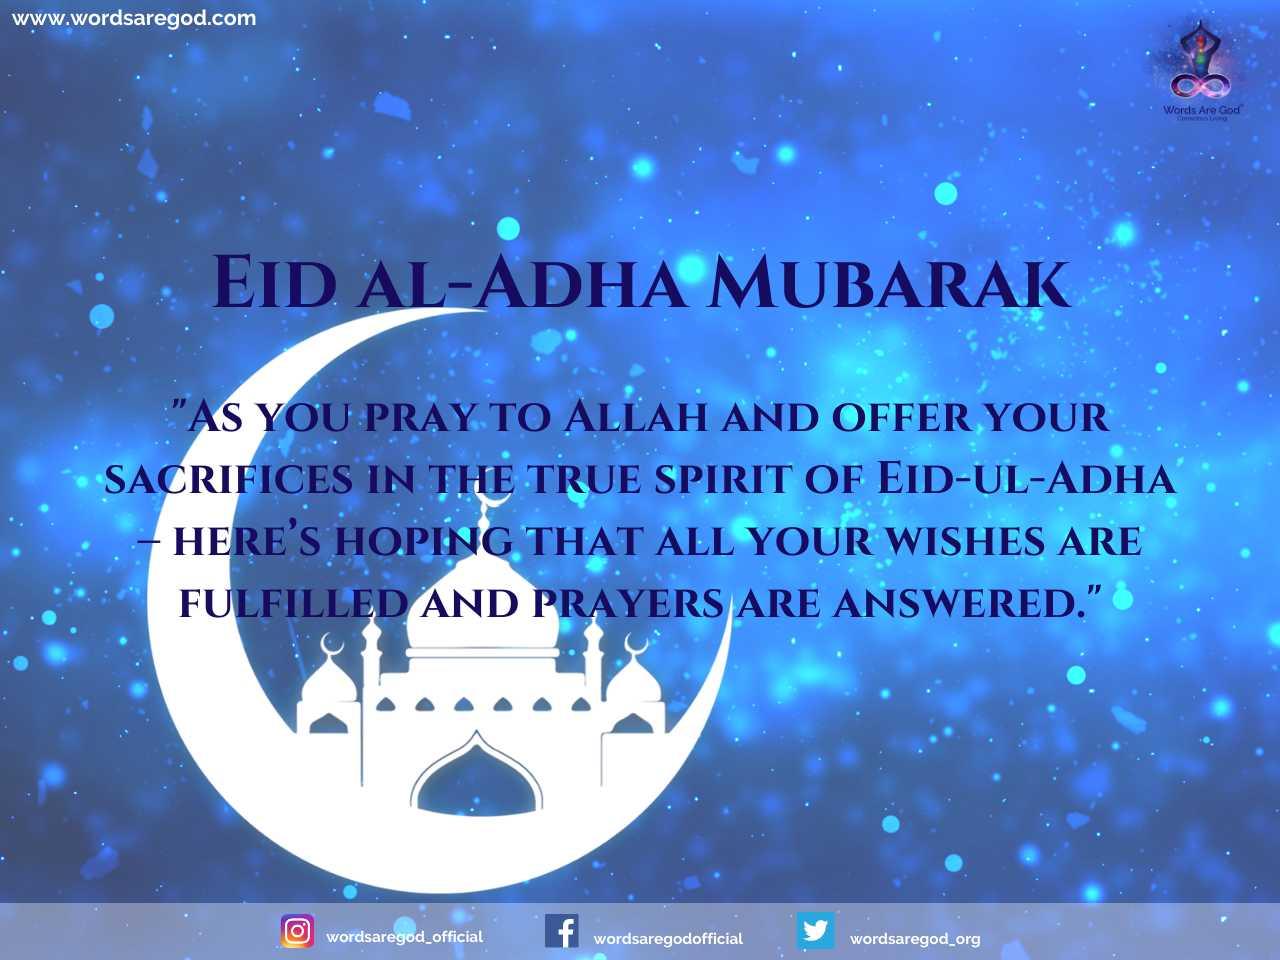 Happy Eid-Al-Adha 2021